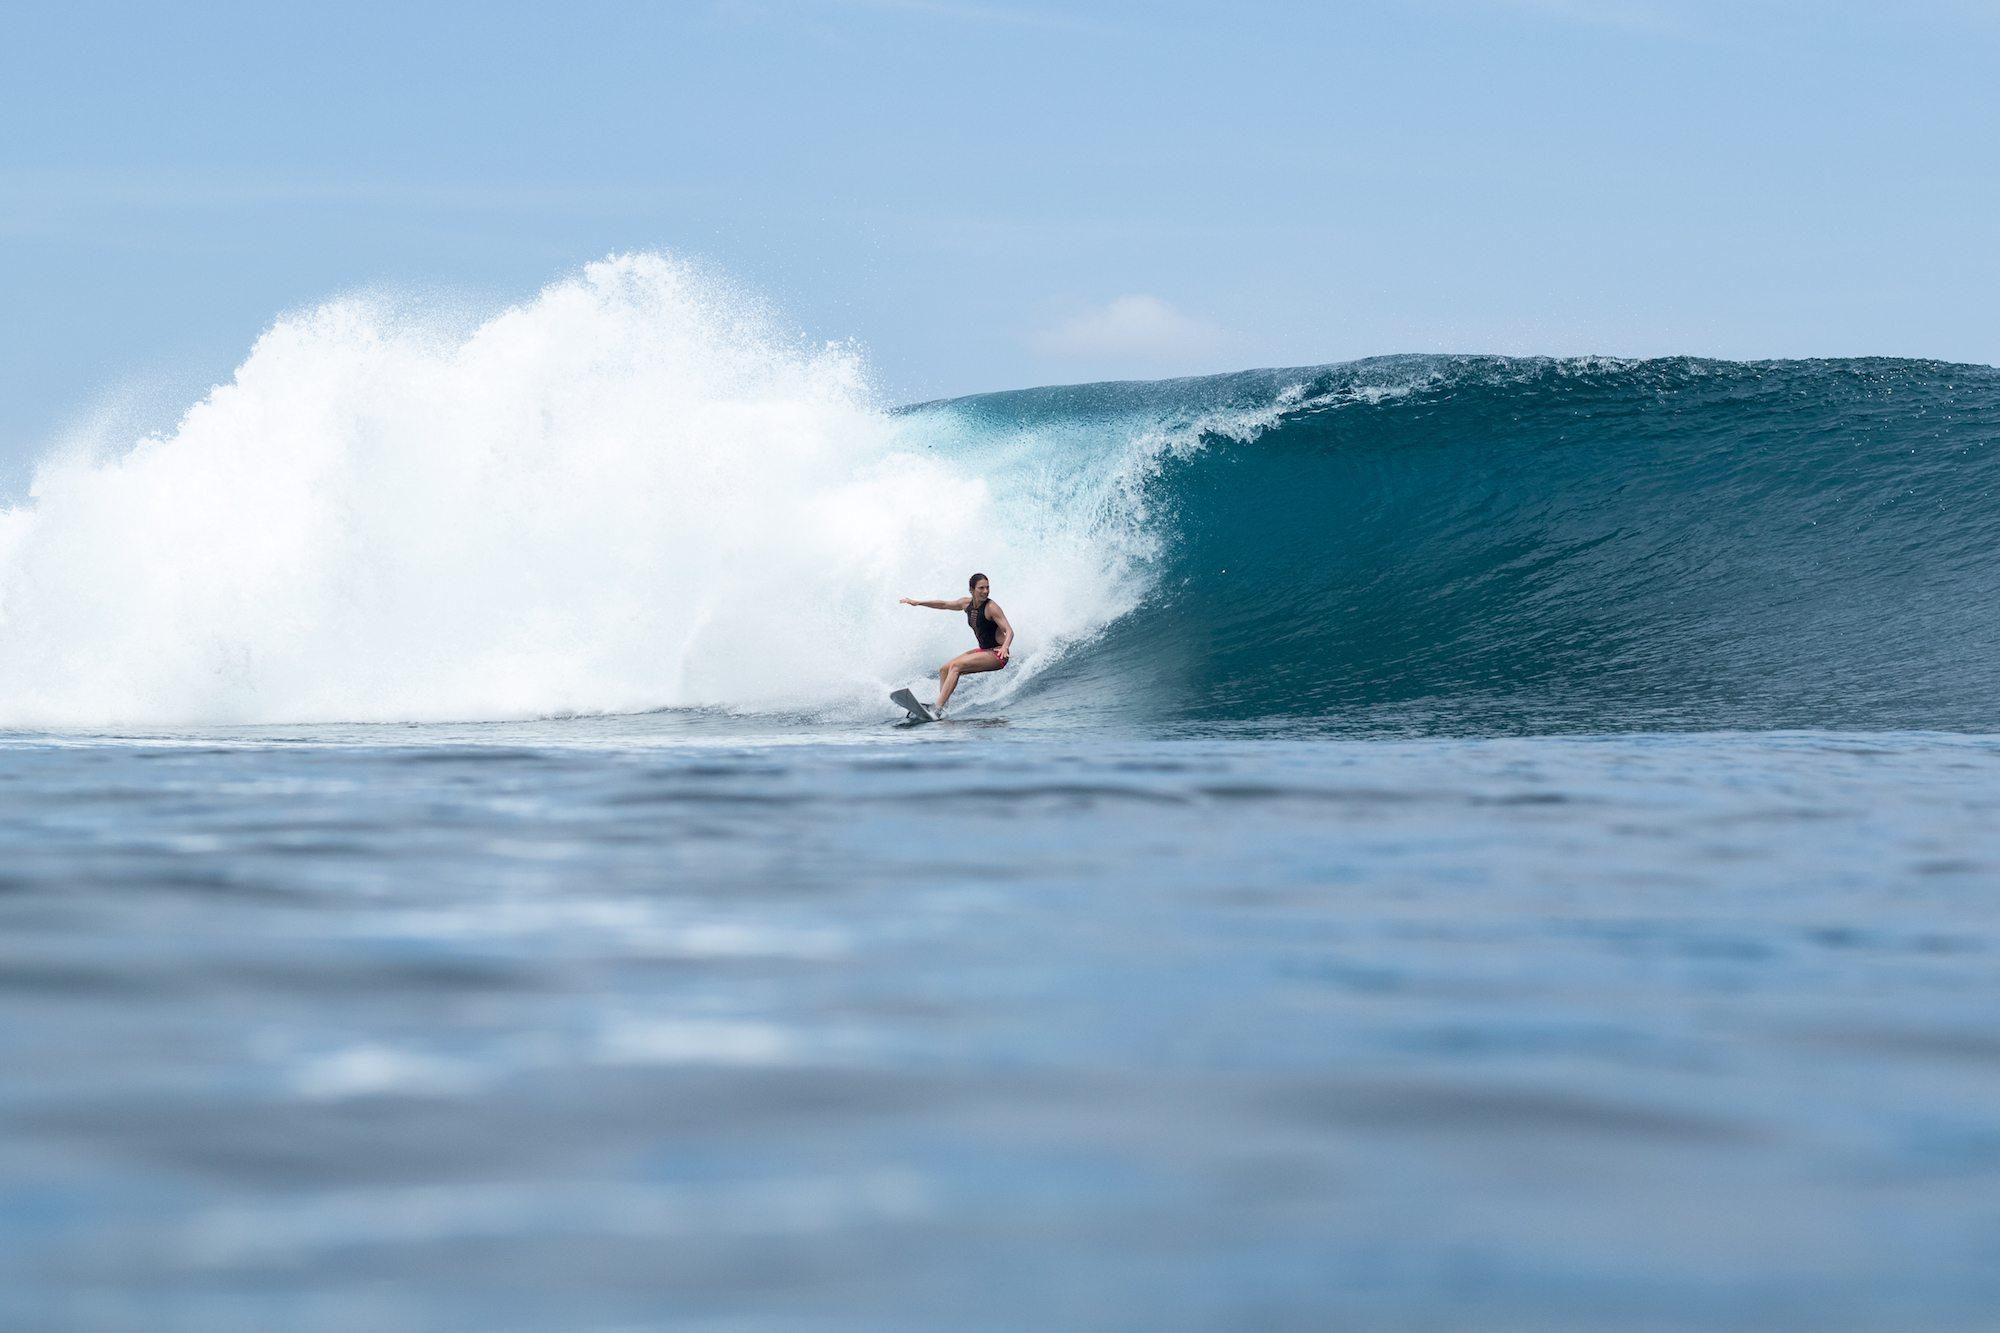 clar aylana surf banyak